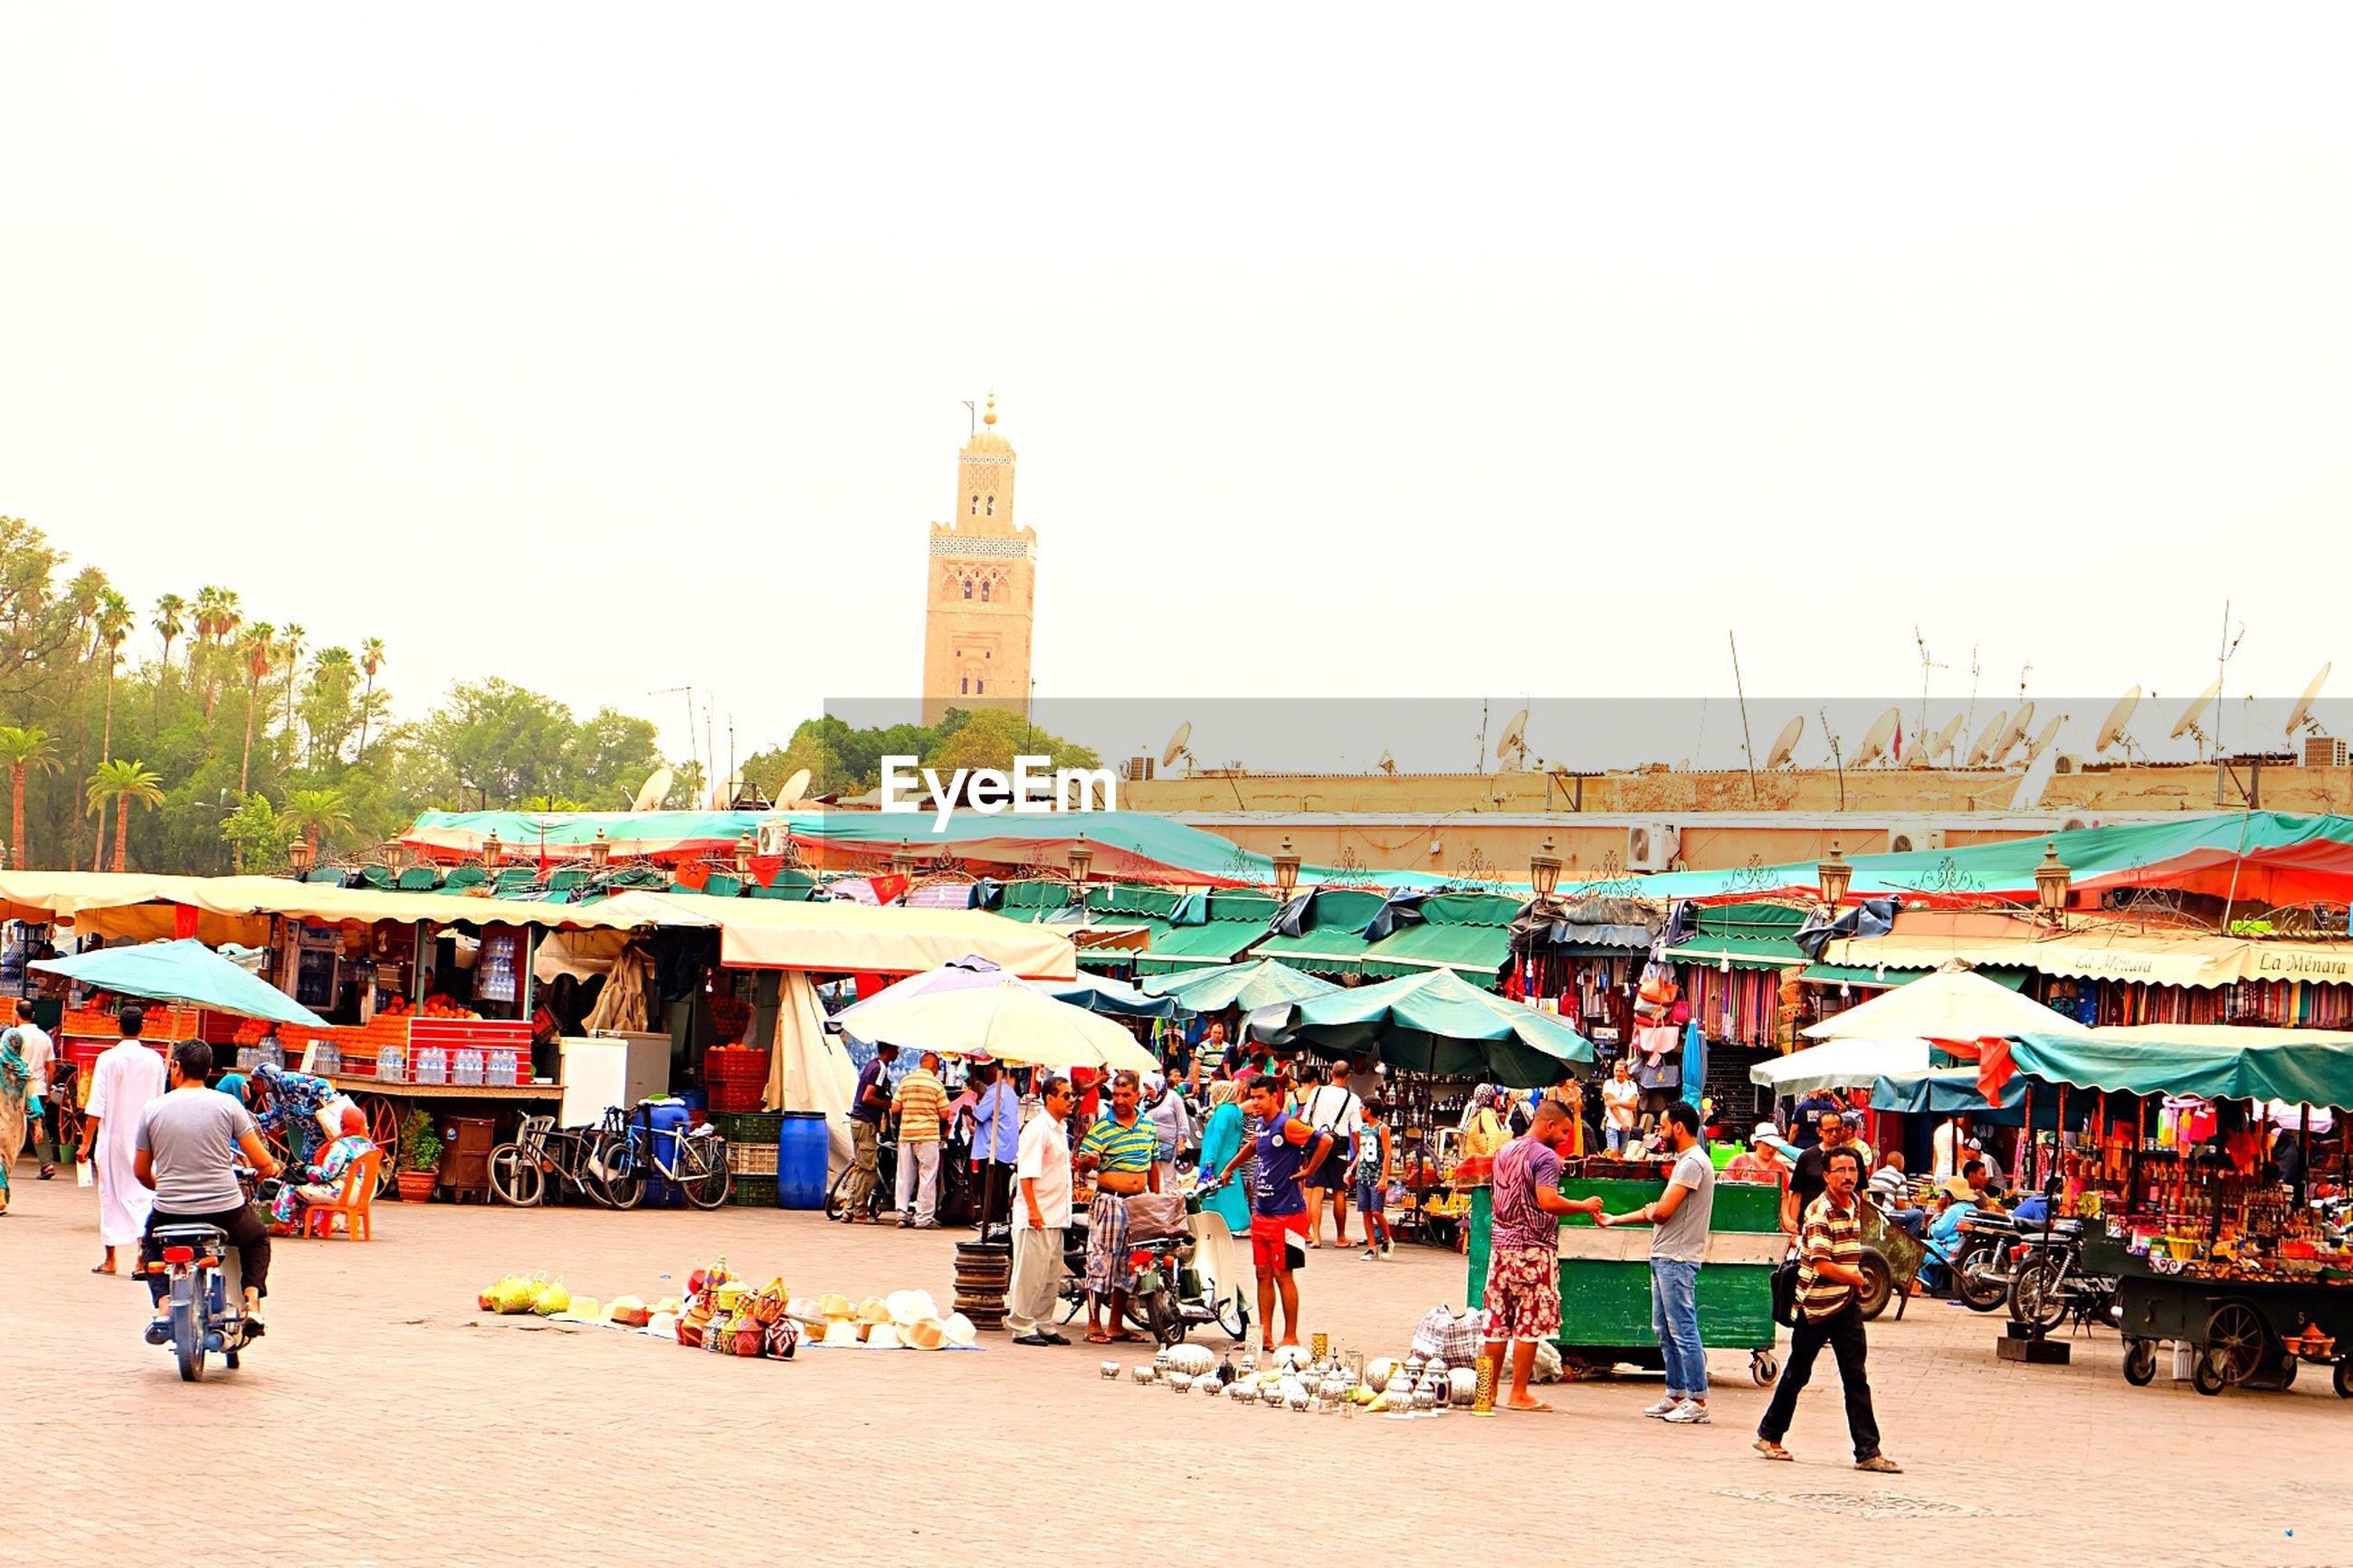 People at street market